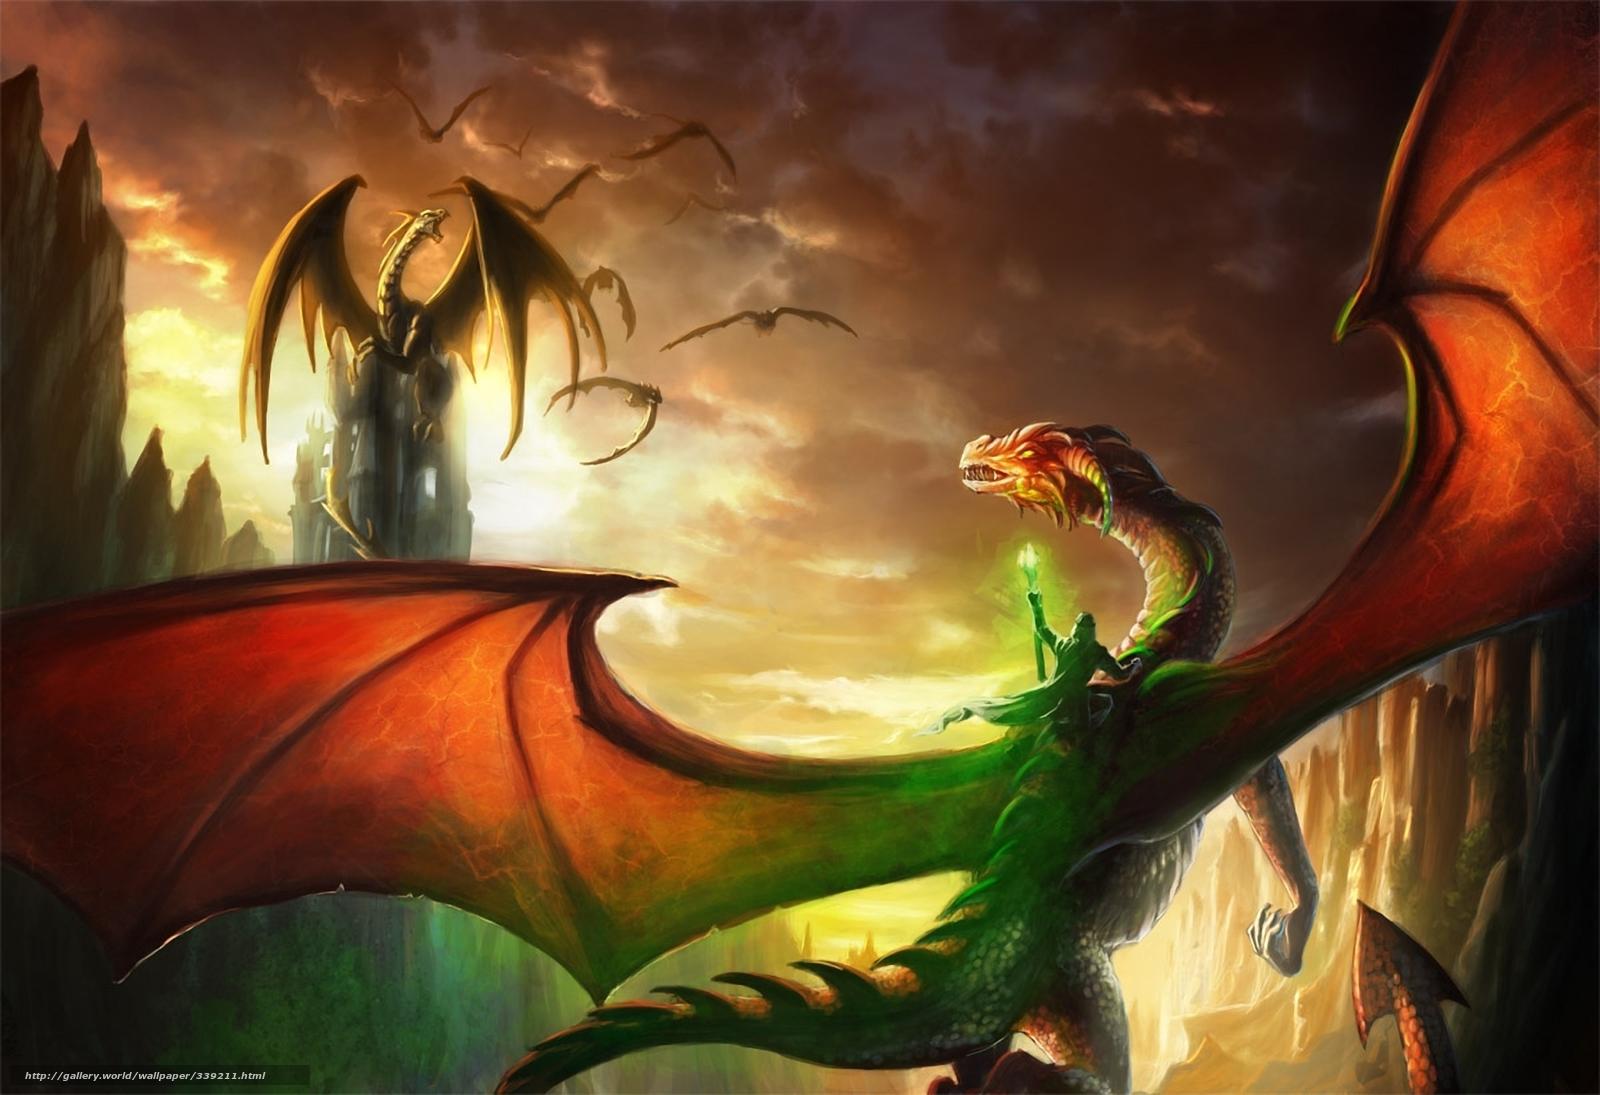 Download Wallpaper Art, Dragons, Rider, Mage Free Desktop - Dragon Fight - HD Wallpaper